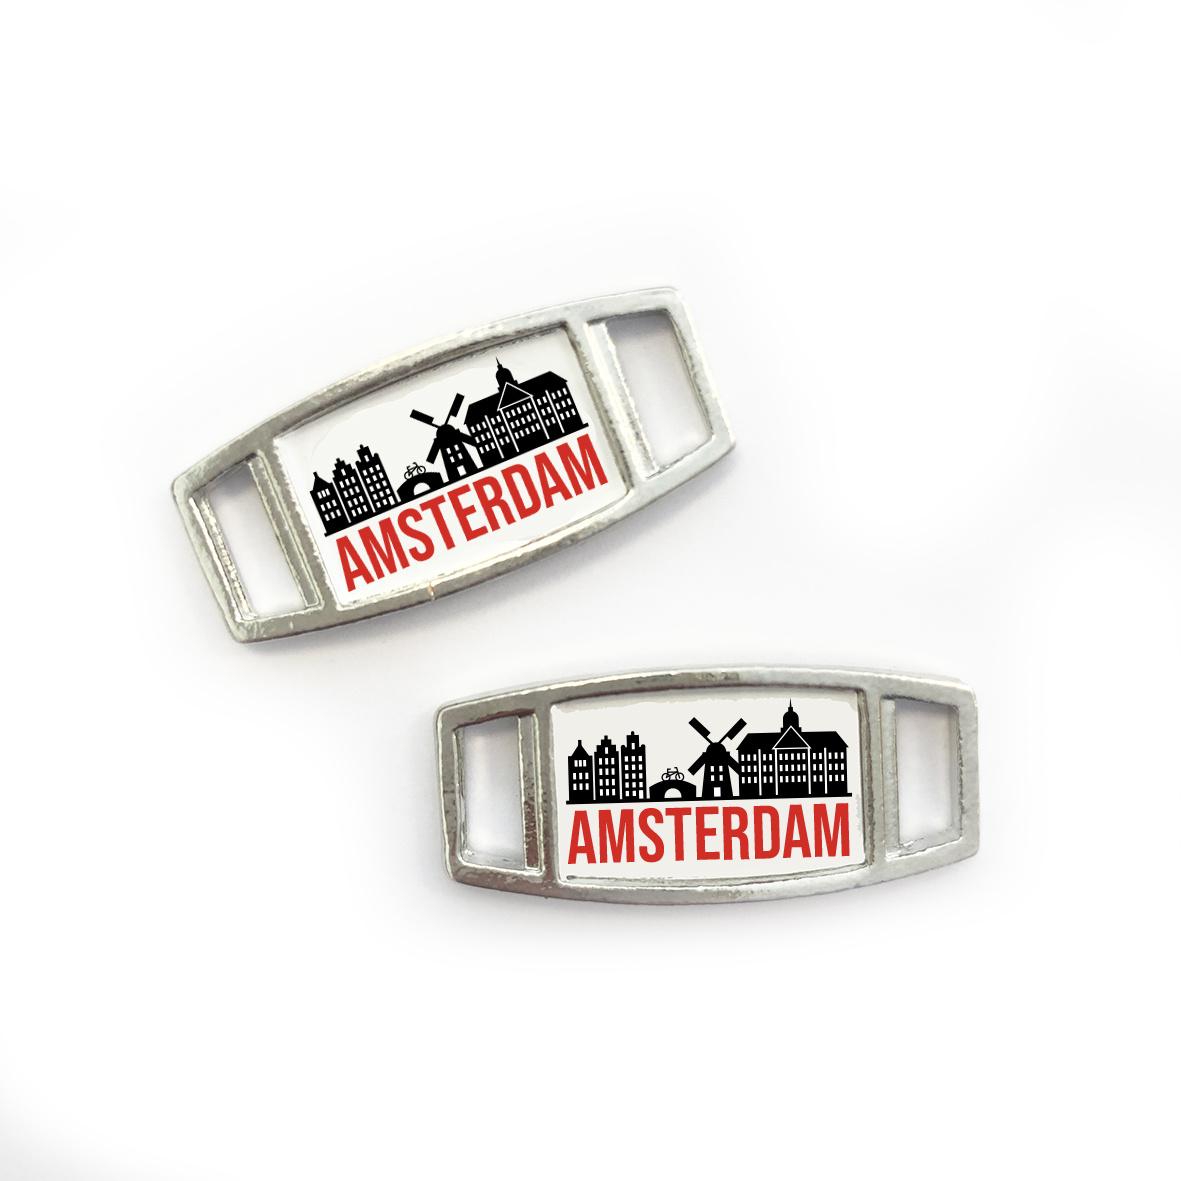 Marathon Amsterdam - shoe tags